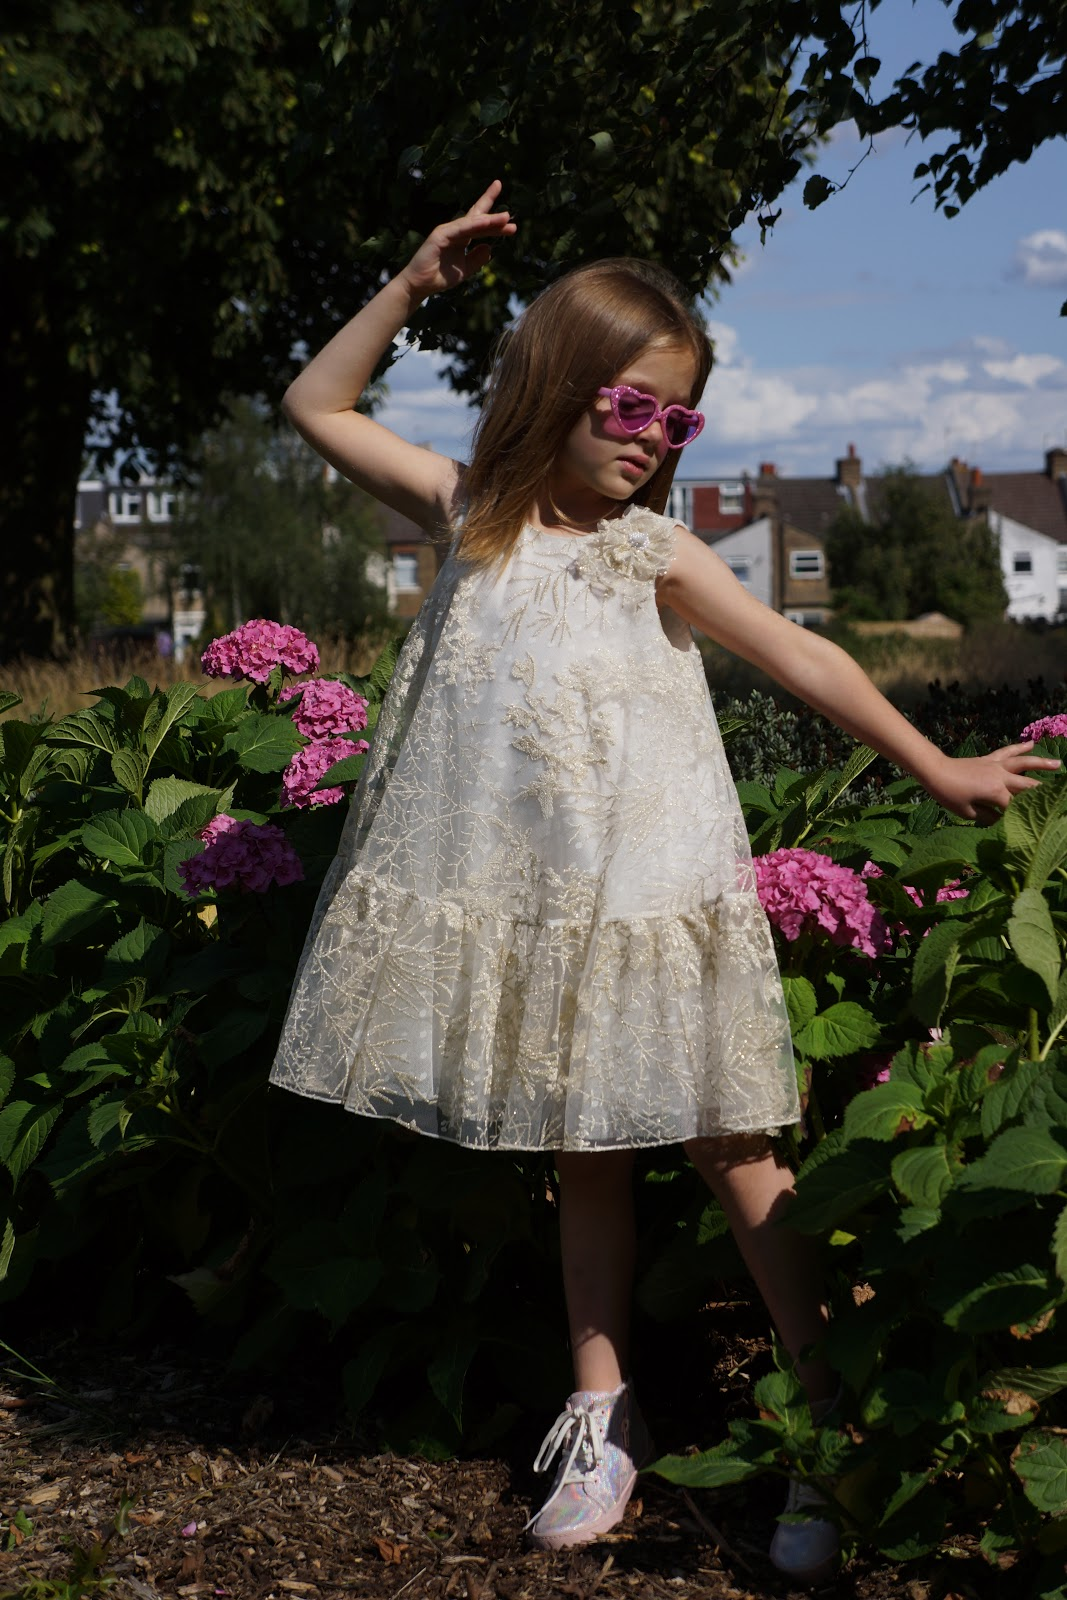 girl in David Charles Childrenswear dress pretending to be a ballet dancer